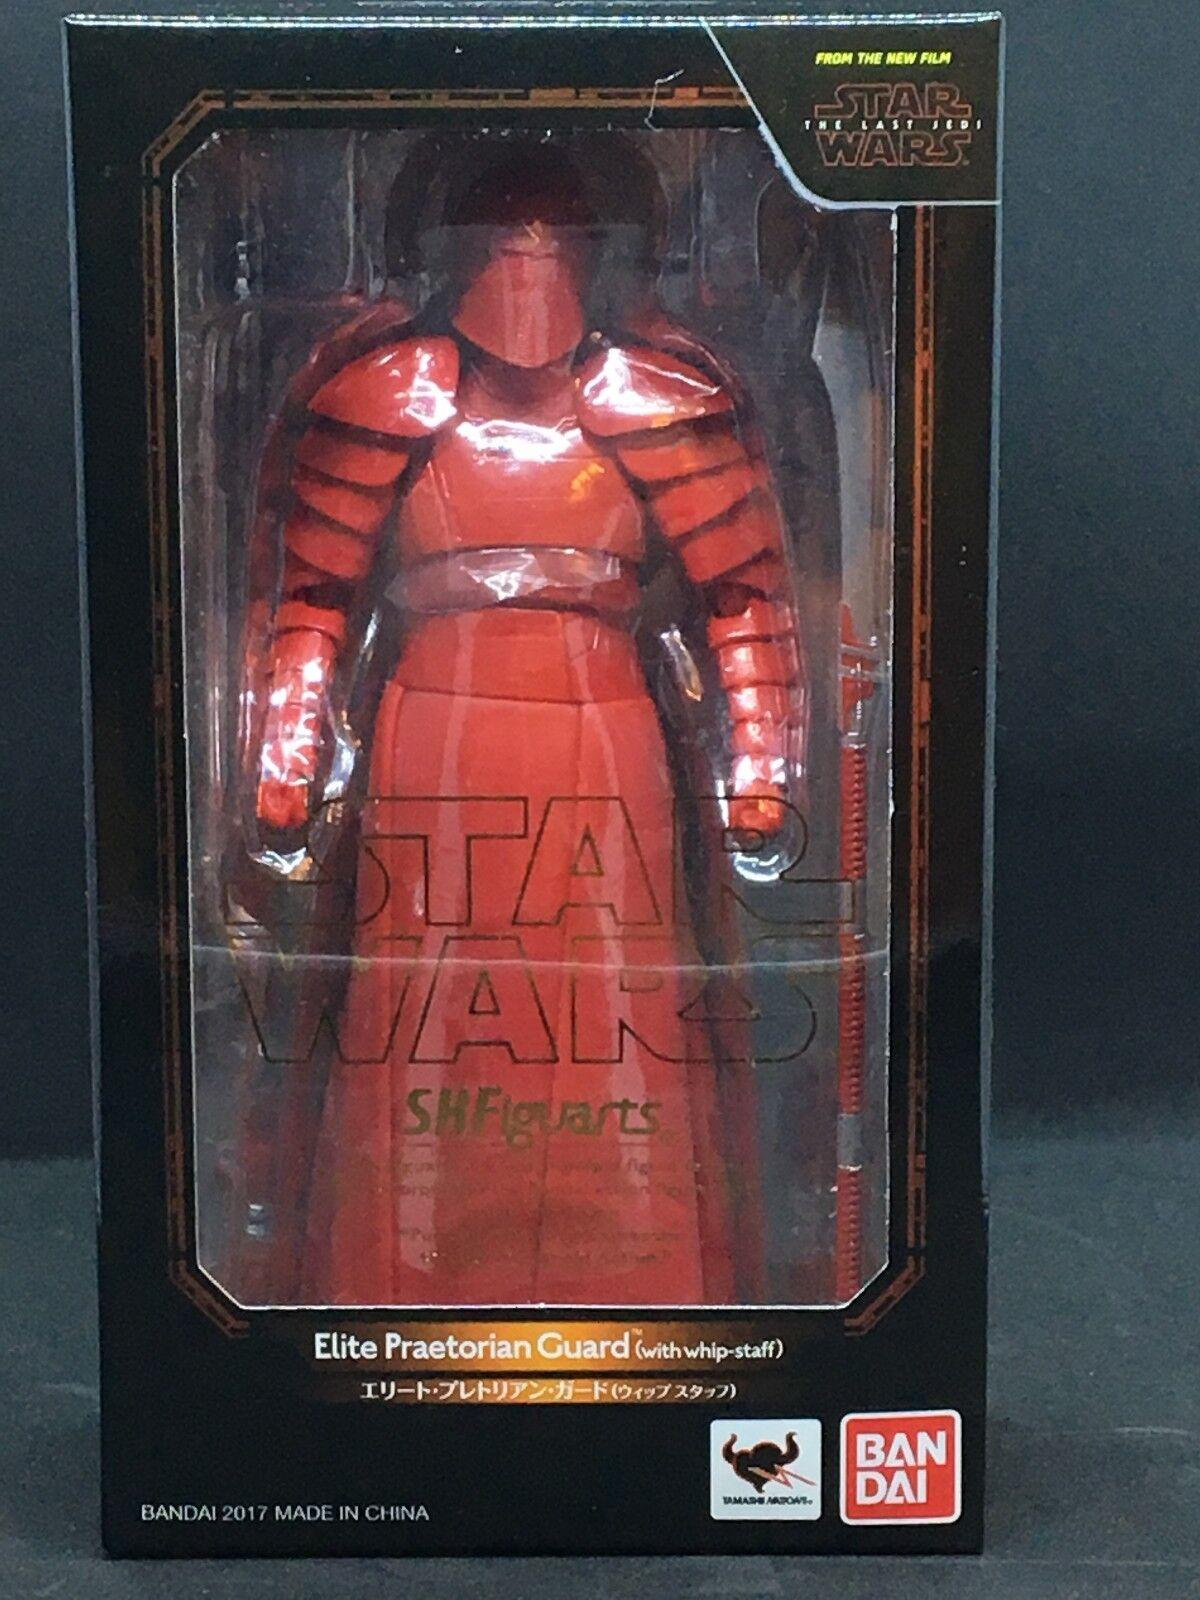 Bandai S.H. Figuarts Estrella Wars-elite Guardia pretoriana látigo personal la última Jedi